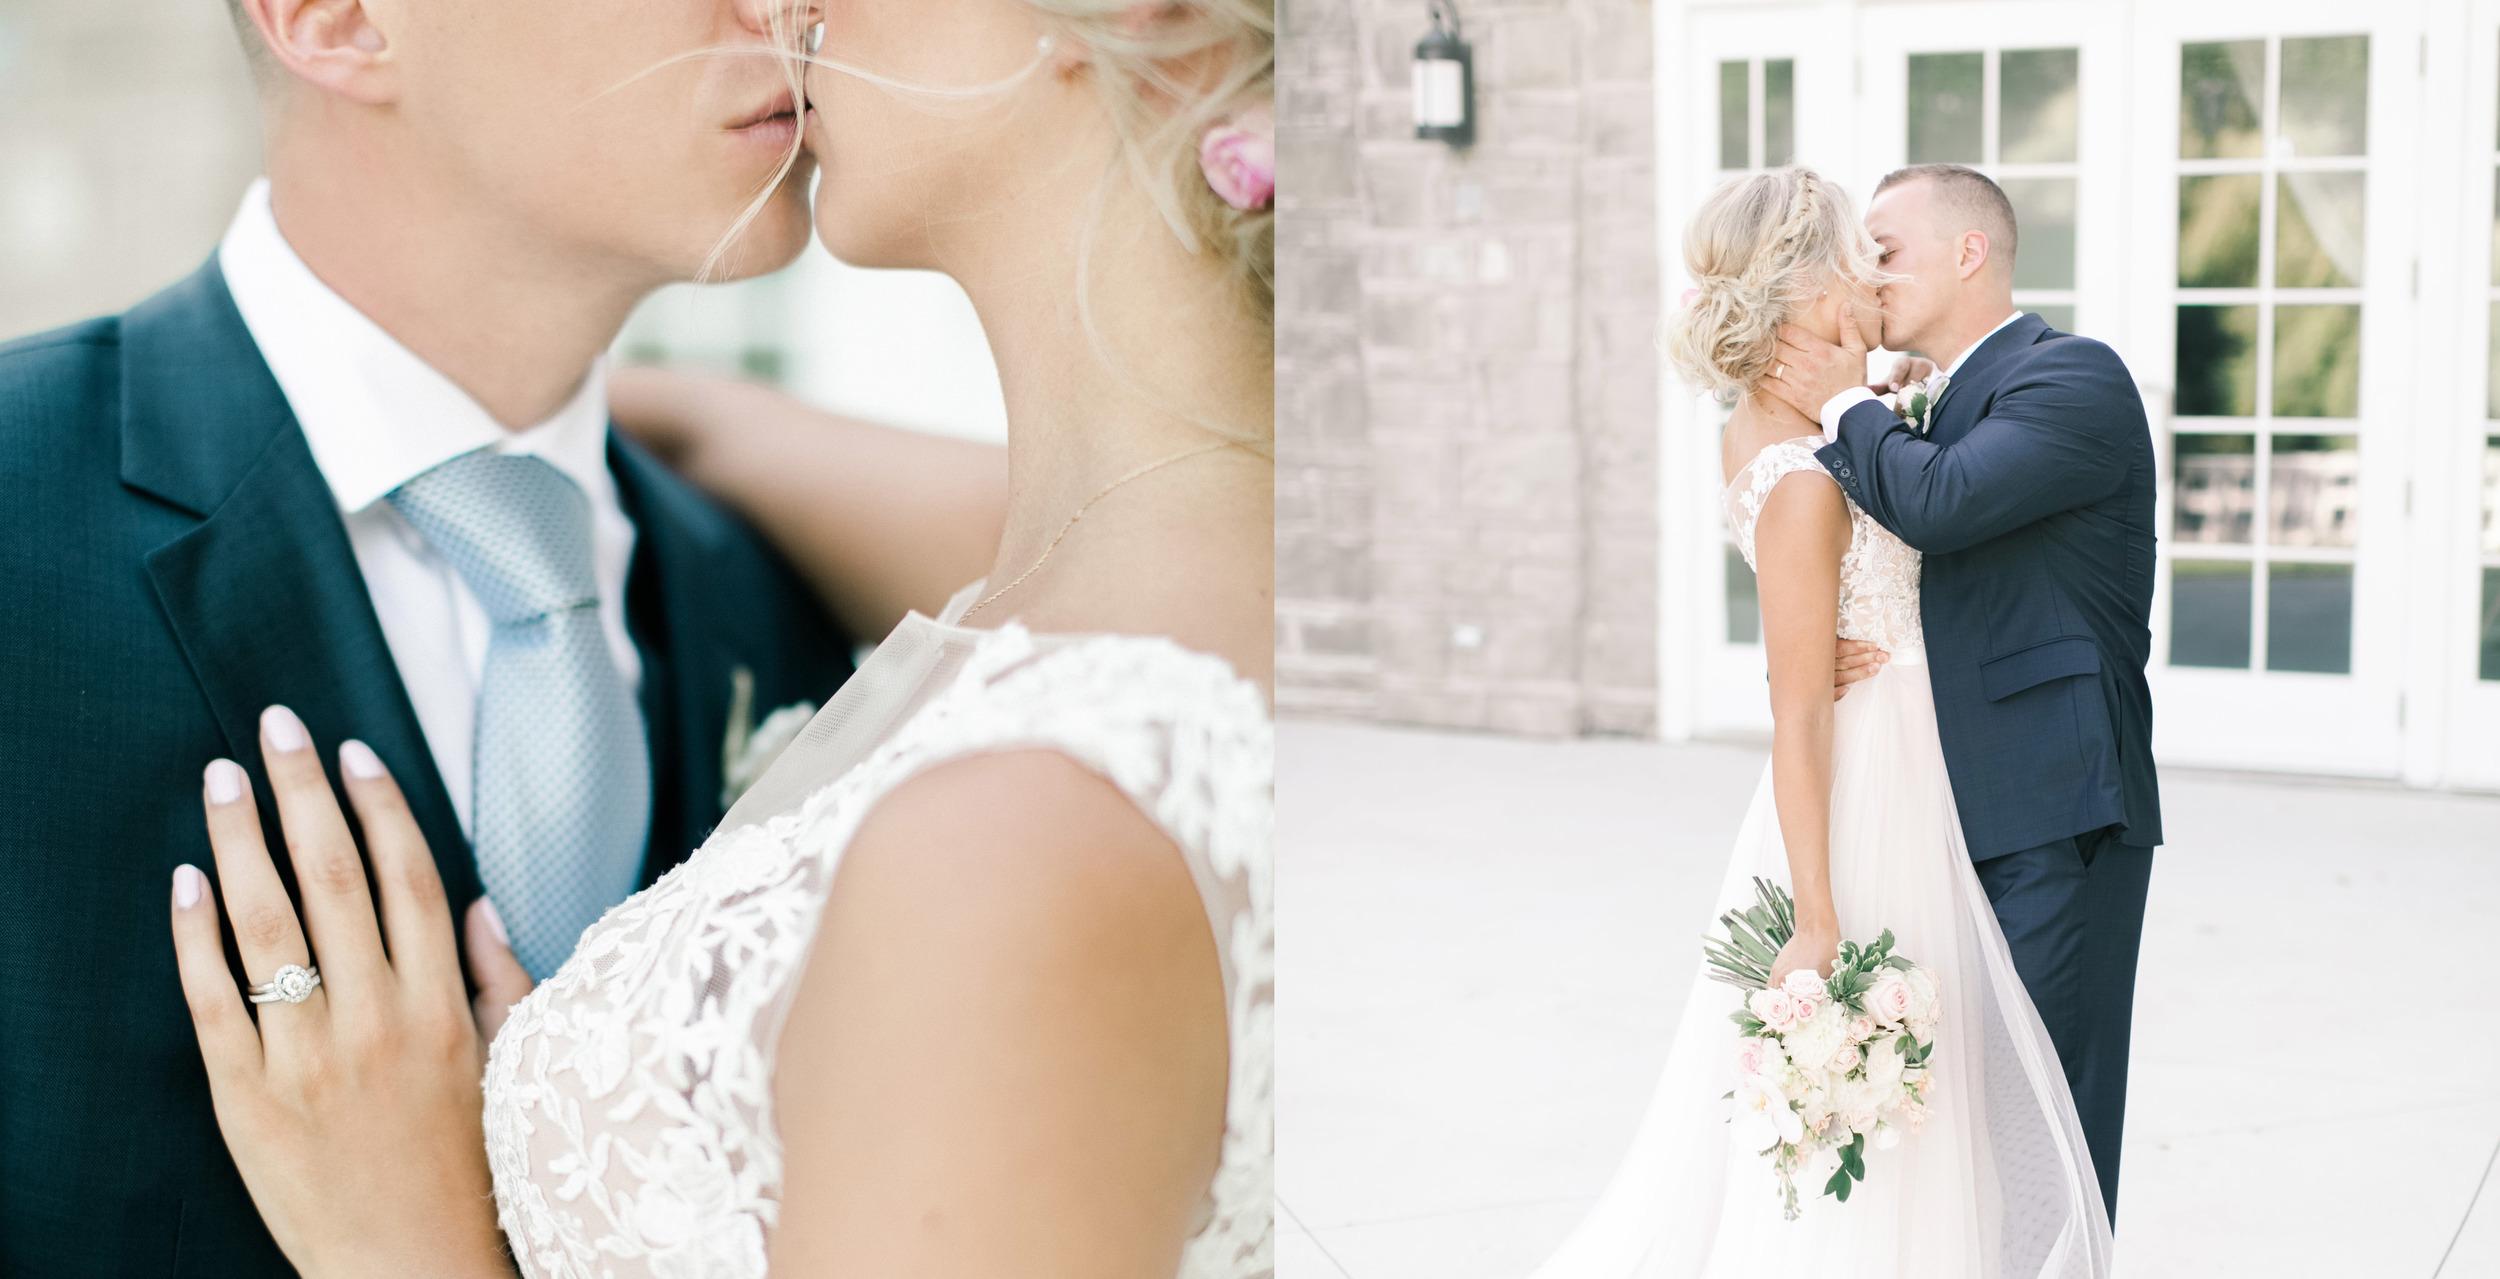 holcim-estate-toronto-ontario-high-end-wedding-photographer-richelle-hunter-megan-dustin-preview-WEBSITE.jpg